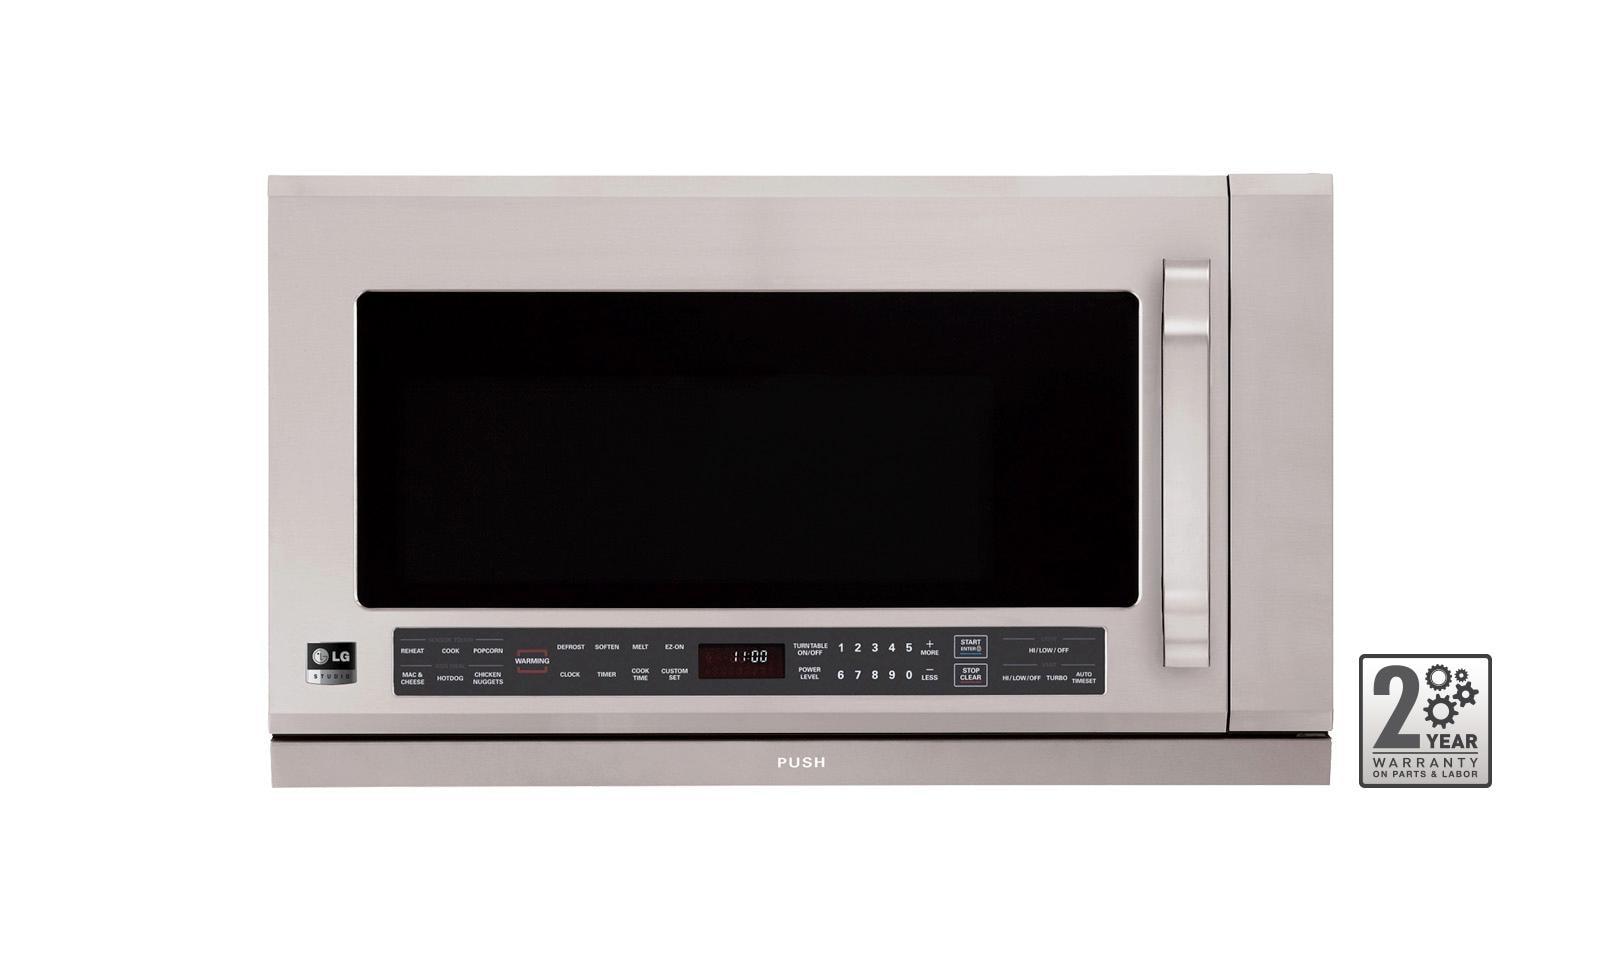 Lg Studio Over The Range Microwave Oven